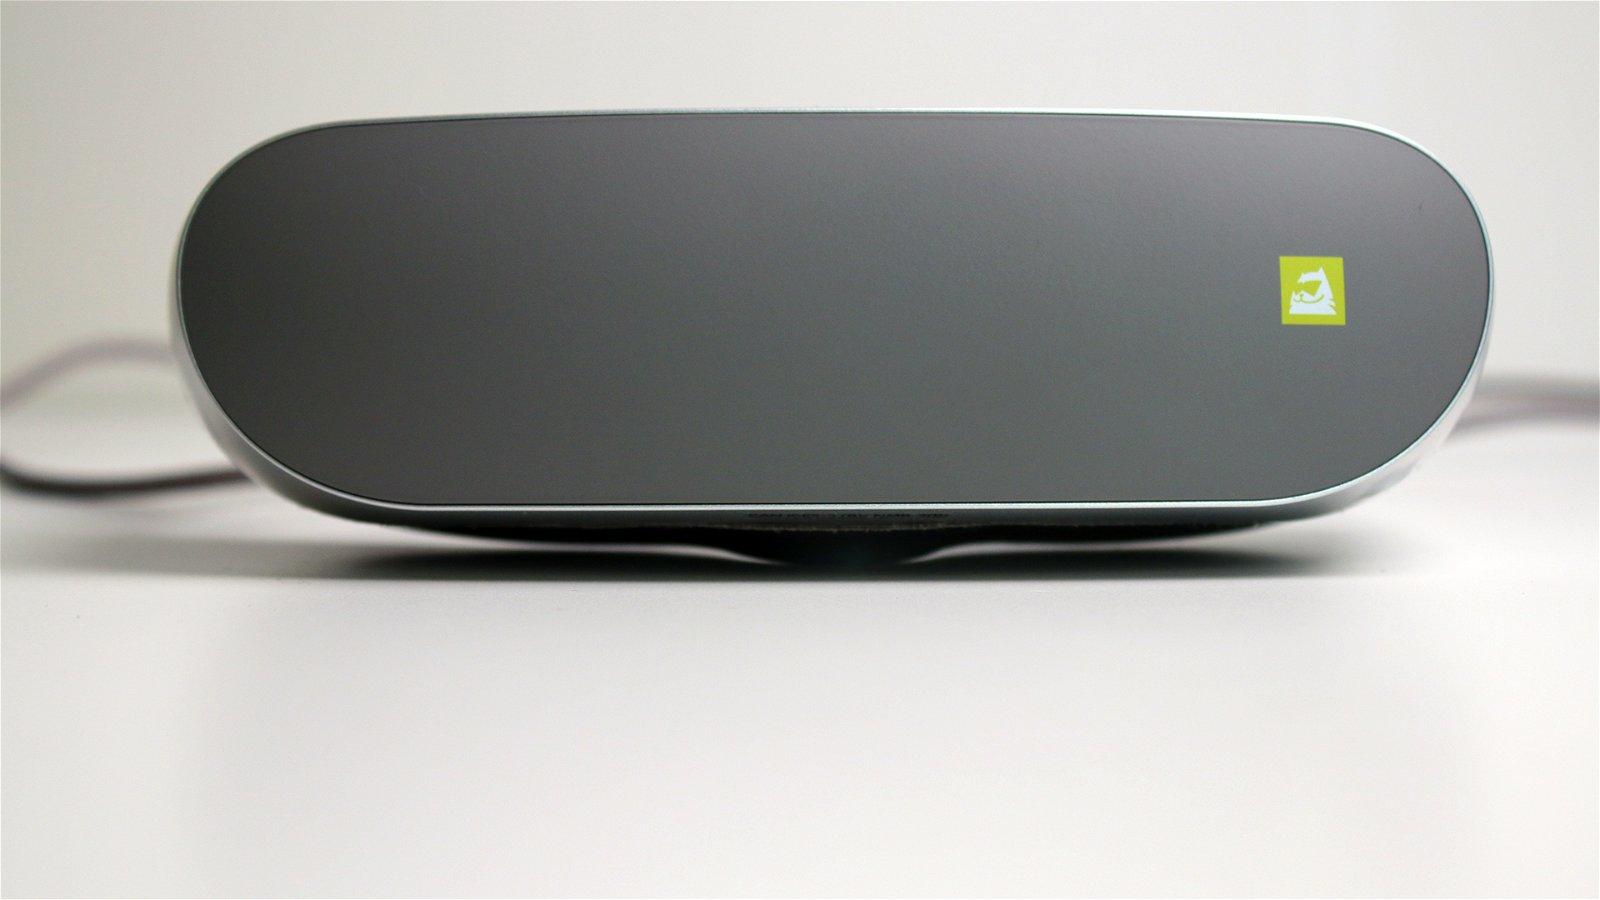 Lg 360 Vr (Vr Headset) Review 2